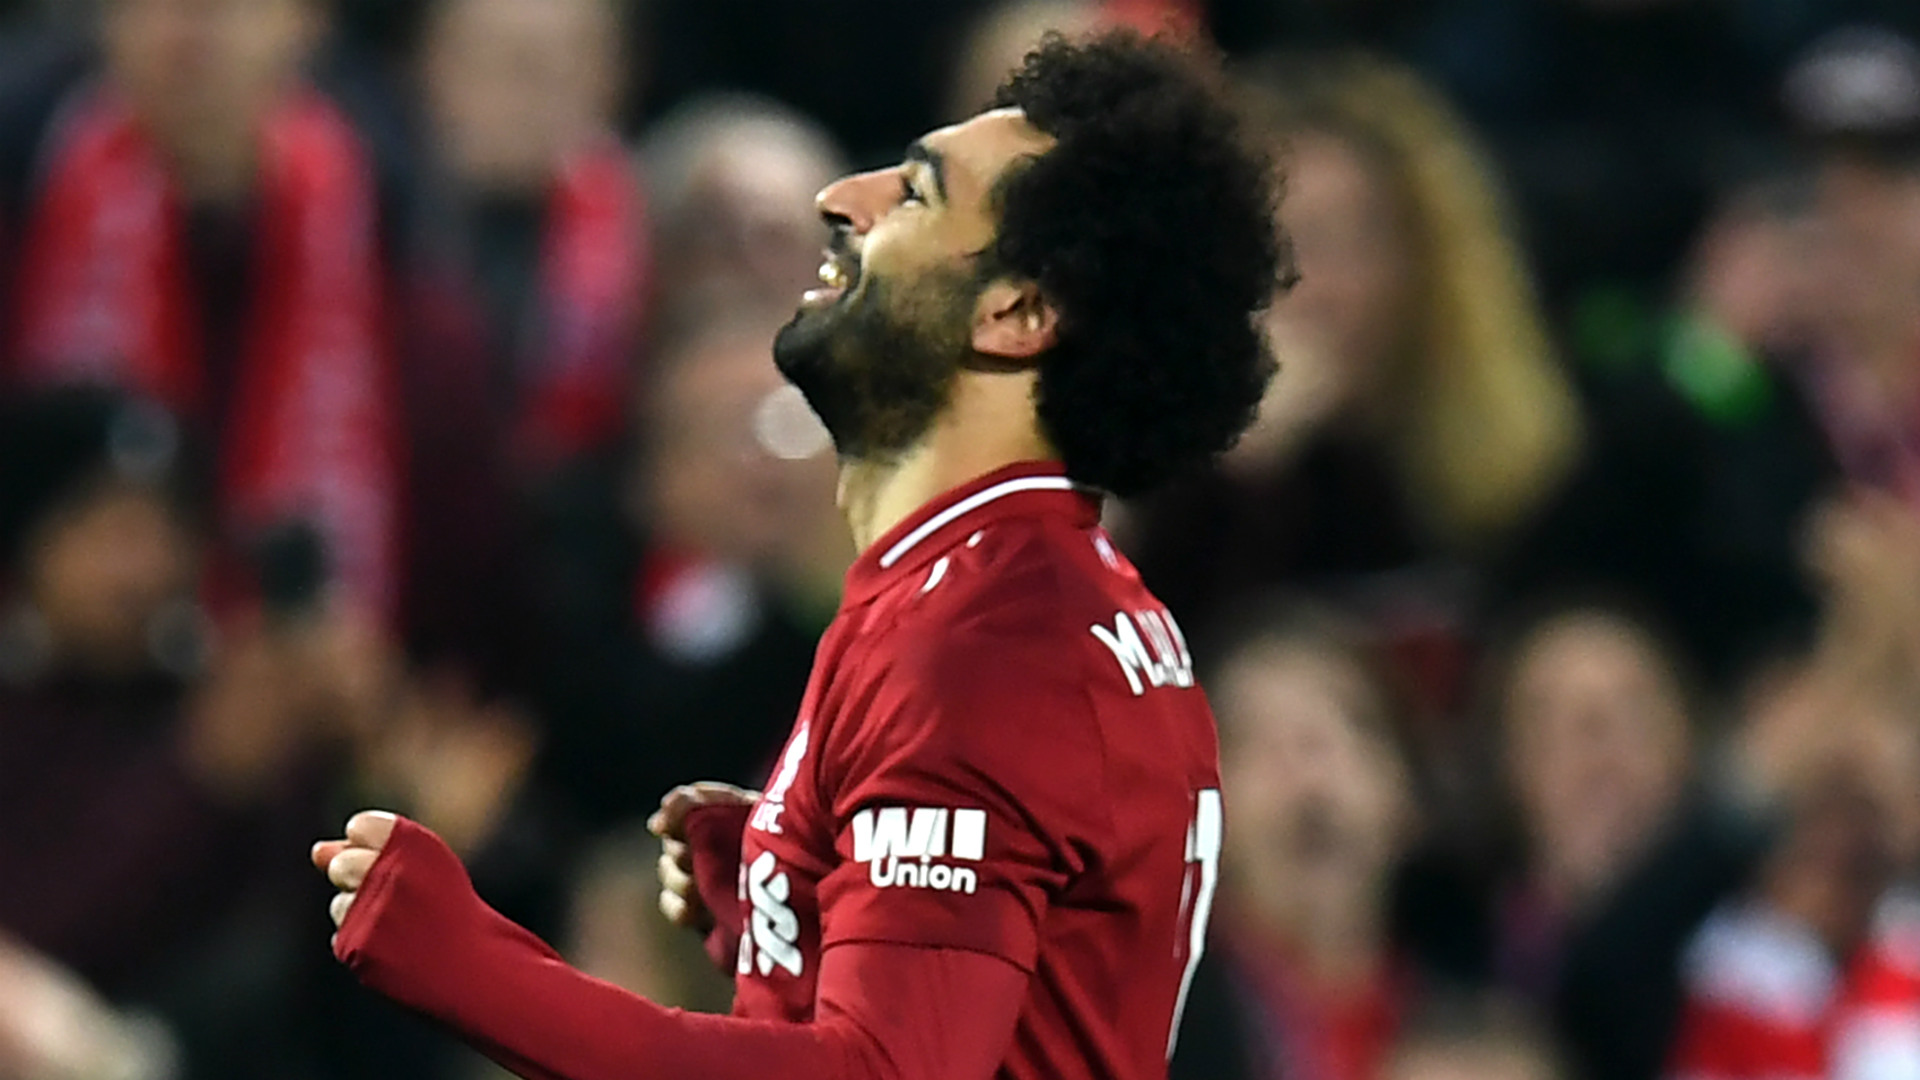 حصاد 2018 محمد صلاح وعام تاريخي Goal Com